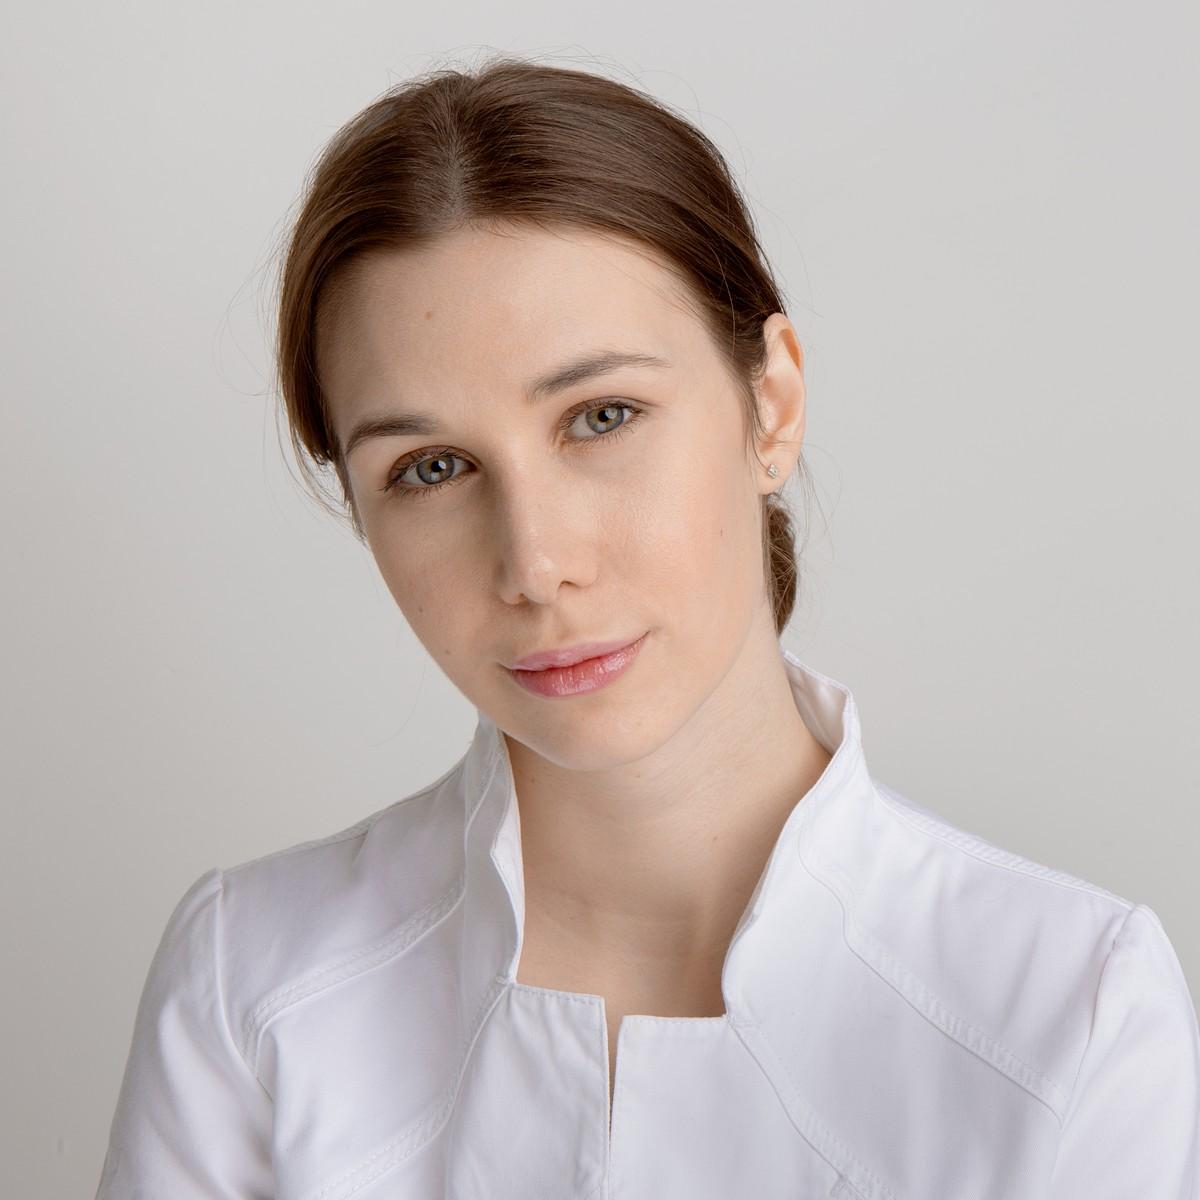 Кохнюк Дарья Владимировна